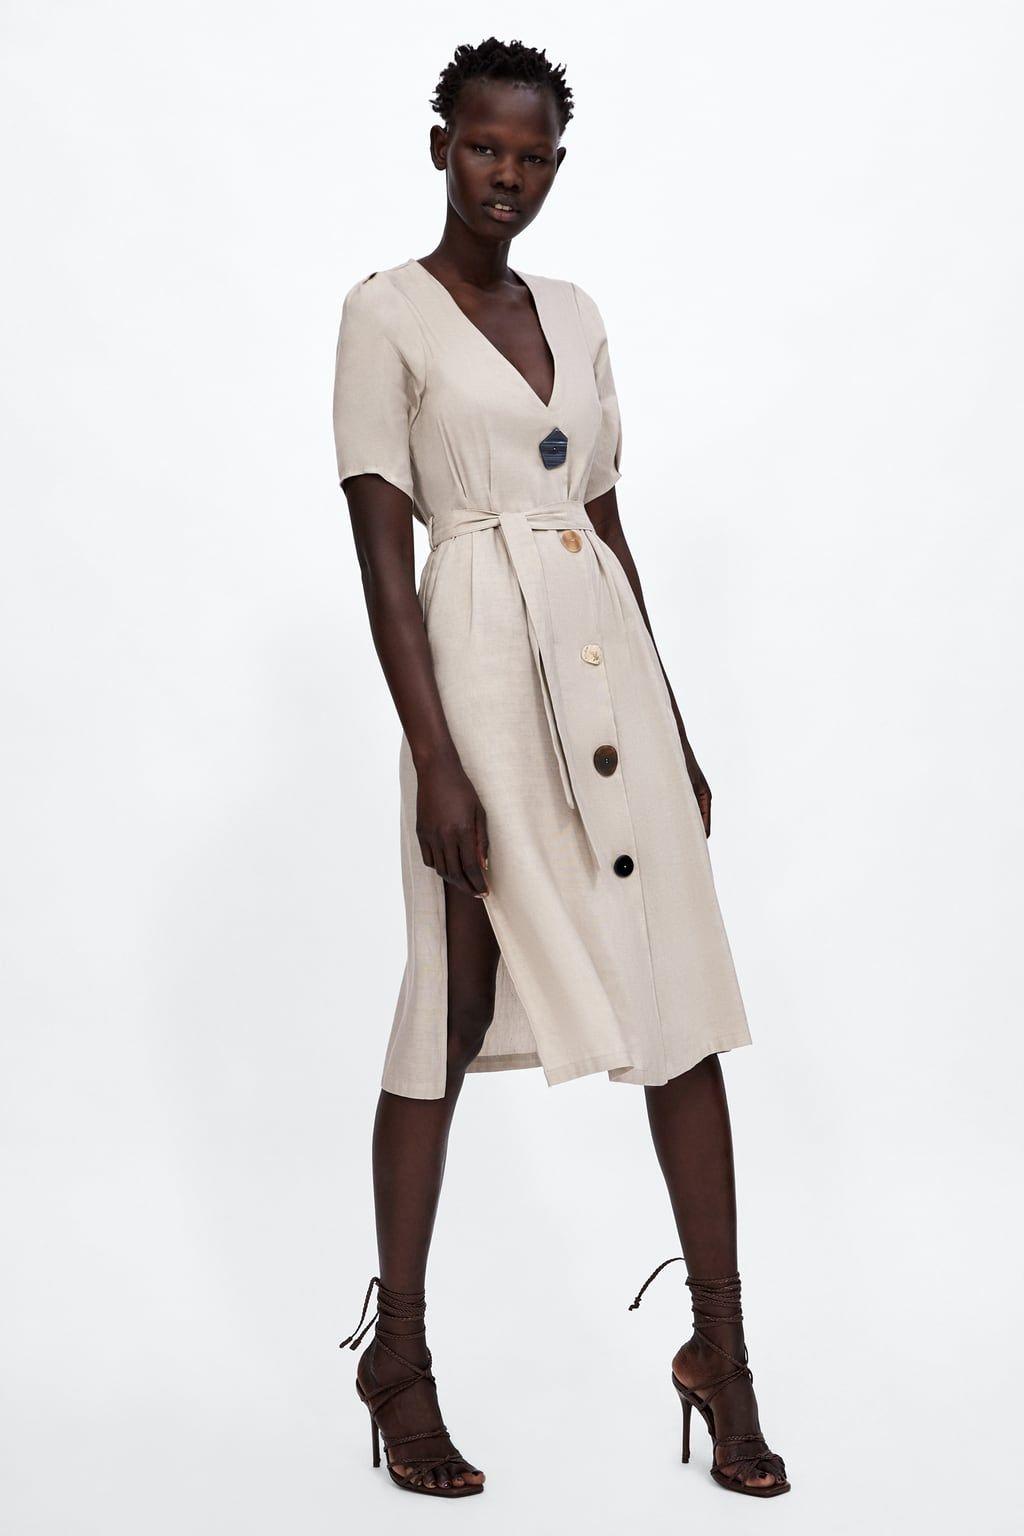 Holiday capsule wardrobe - the summer dress